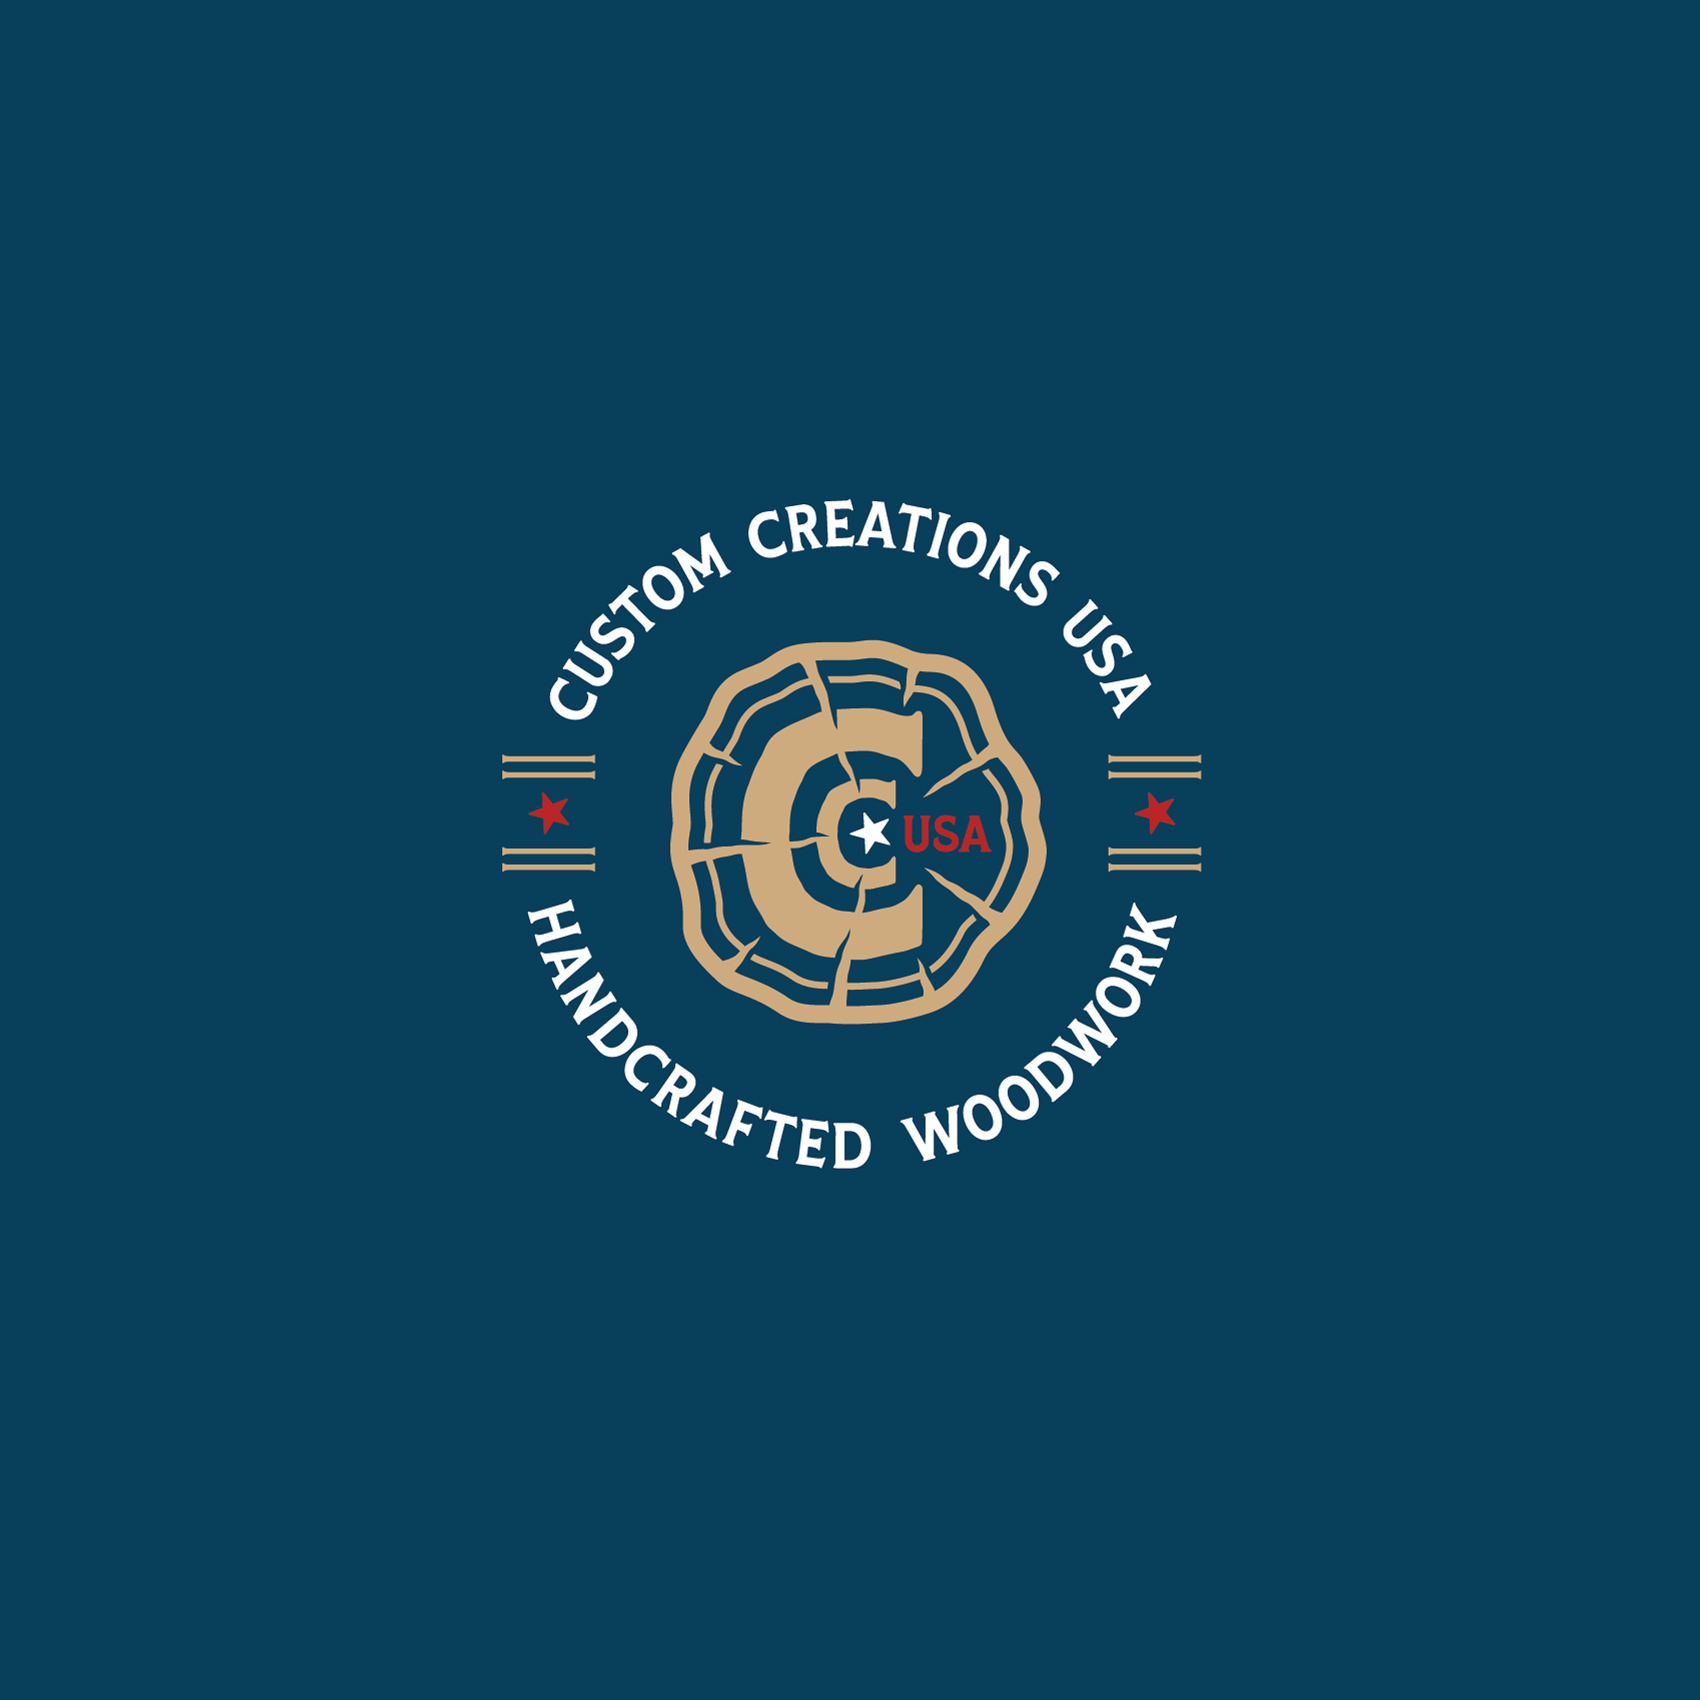 Custom Creations - USA